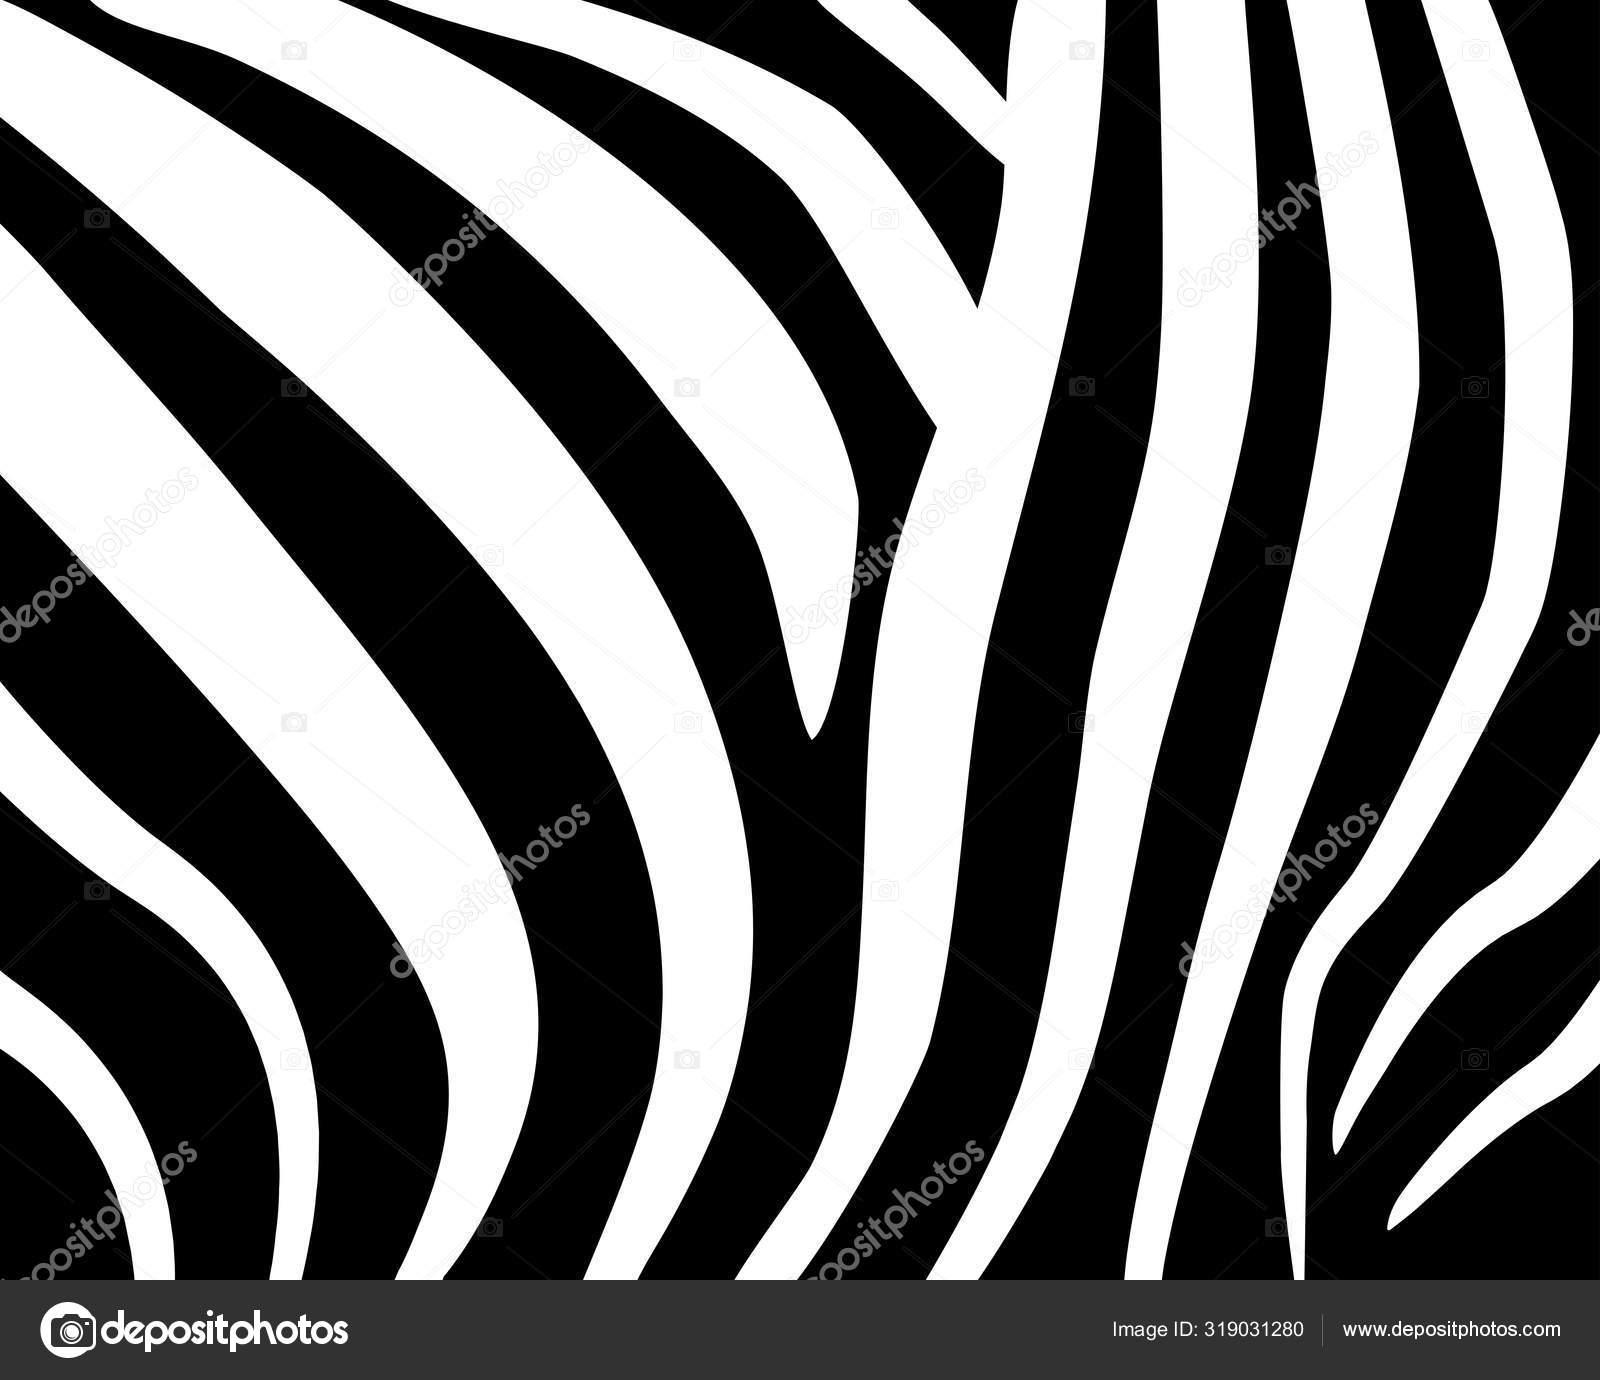 Padrao De Zebra Padrao Geometrico Abstrato Fundo De Pele Animal